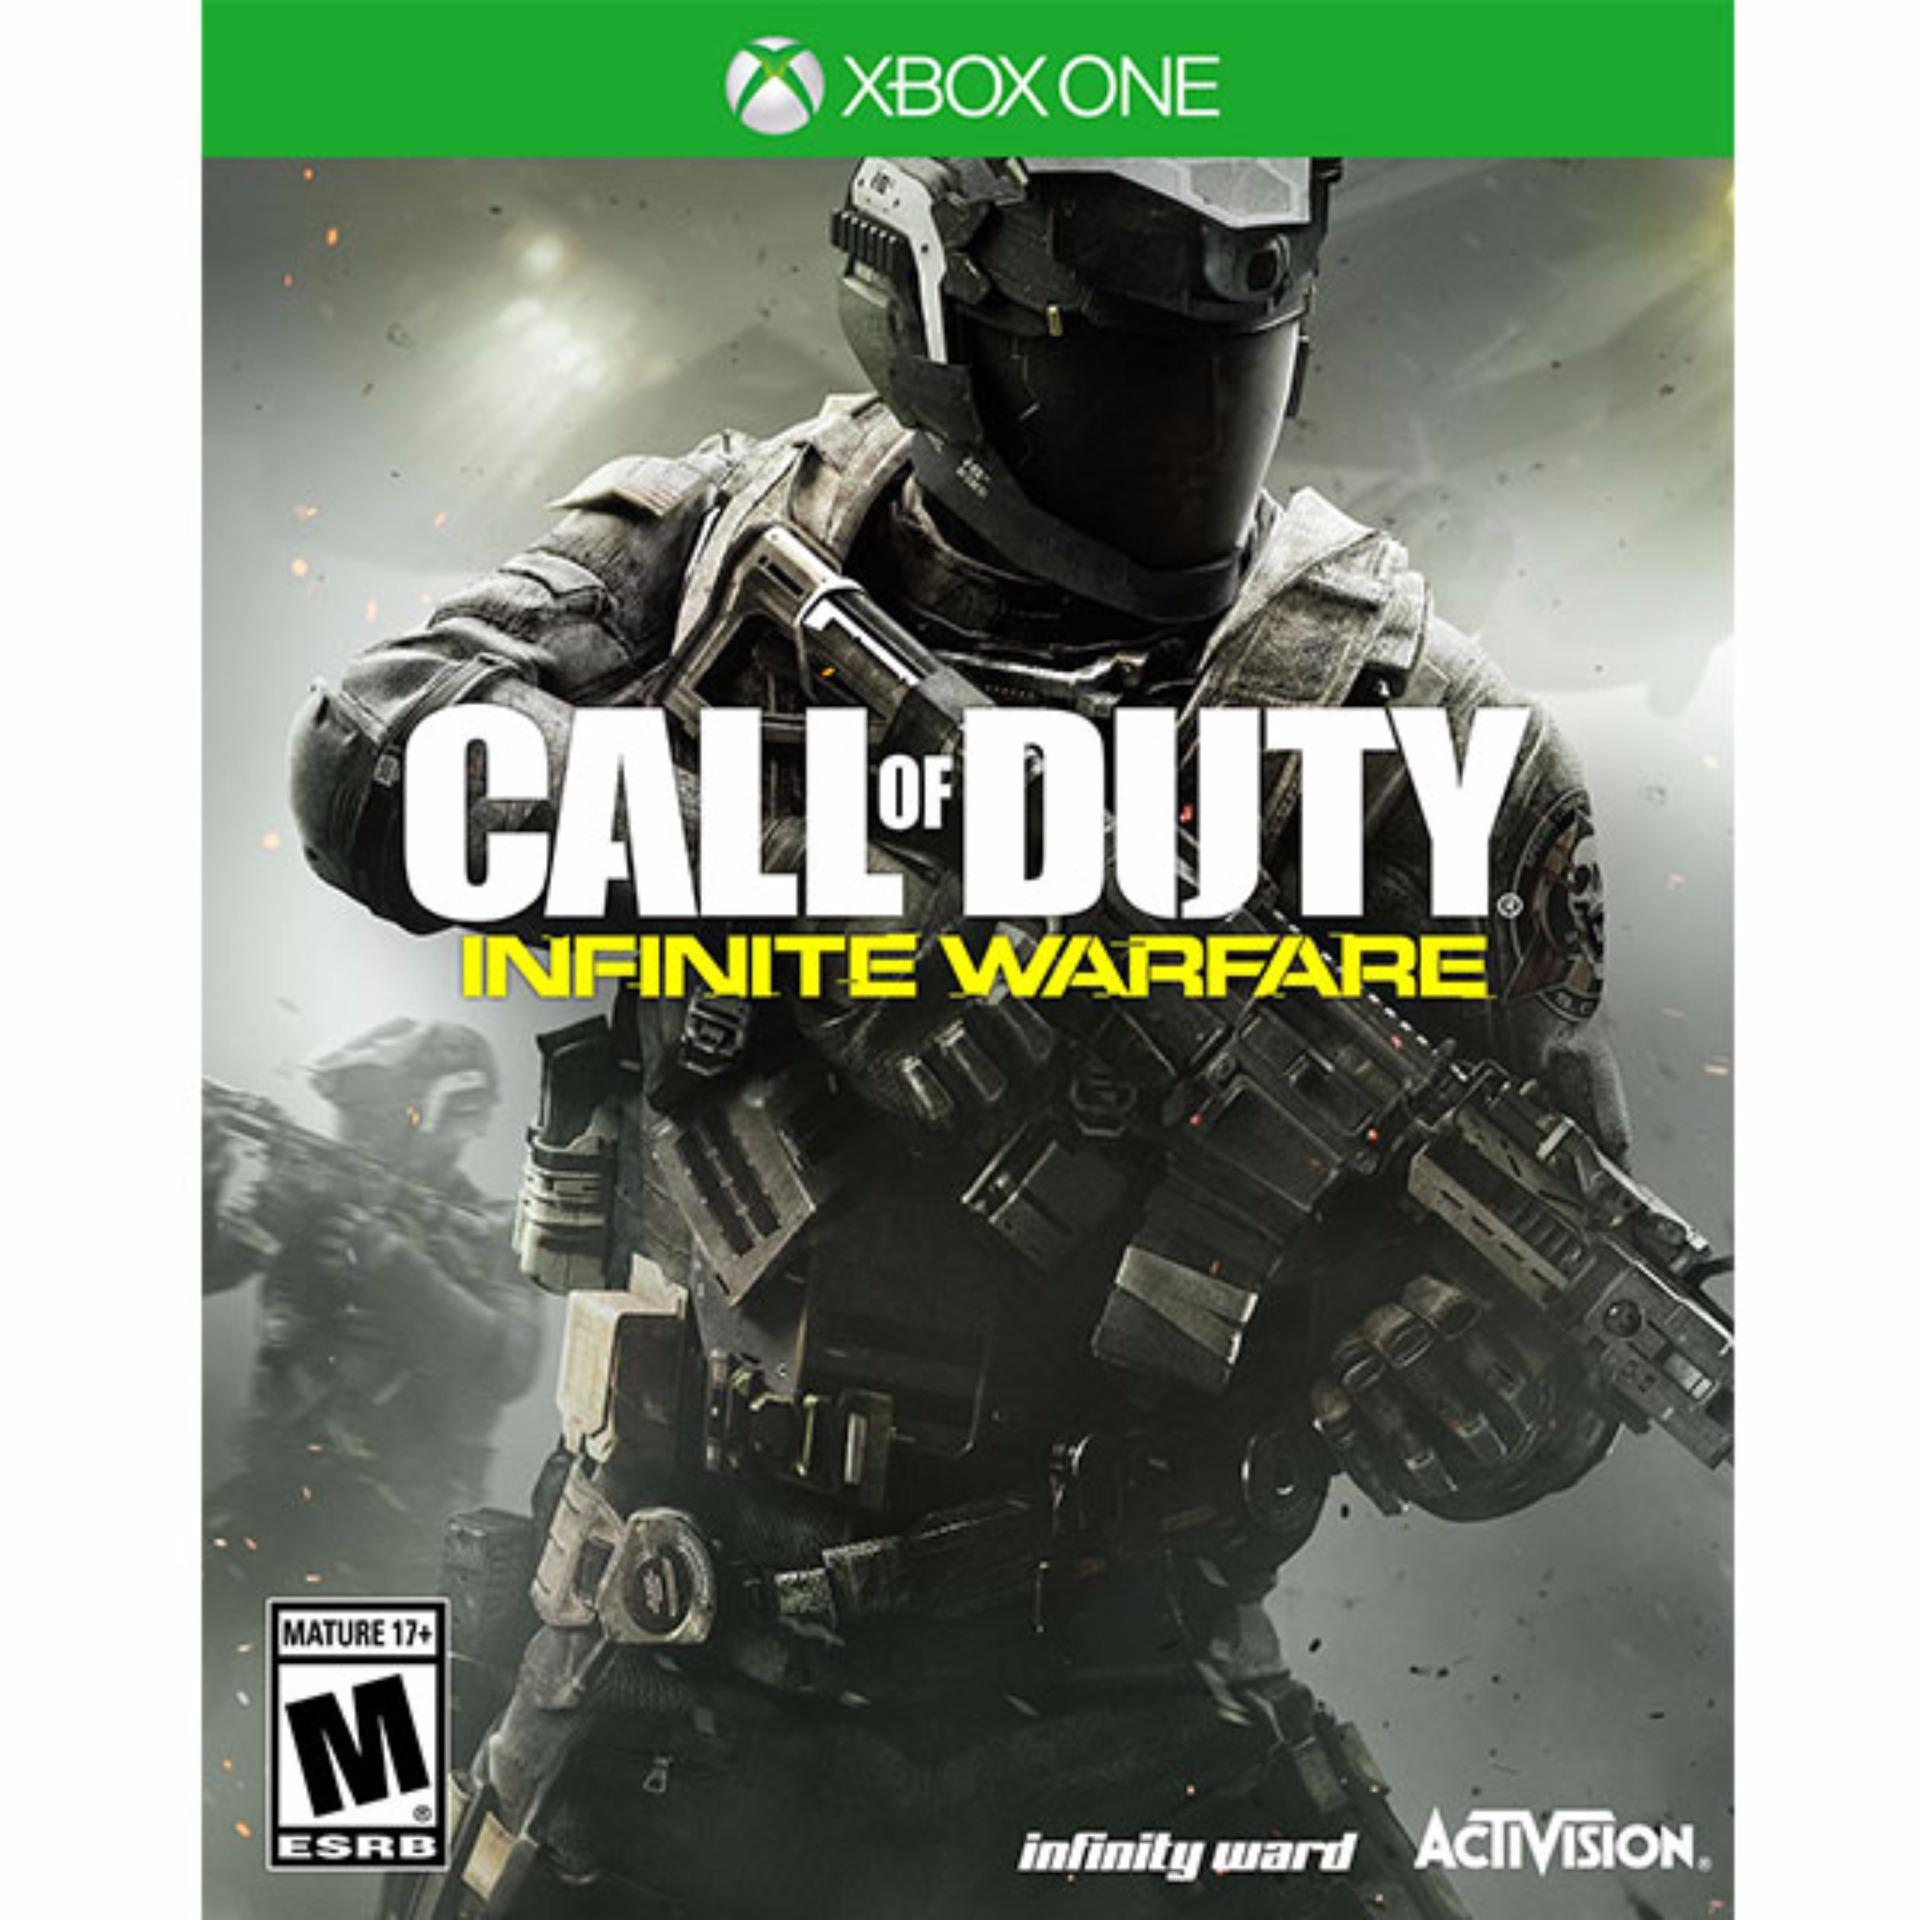 Xbox One Call of Duty Infinite Warefare